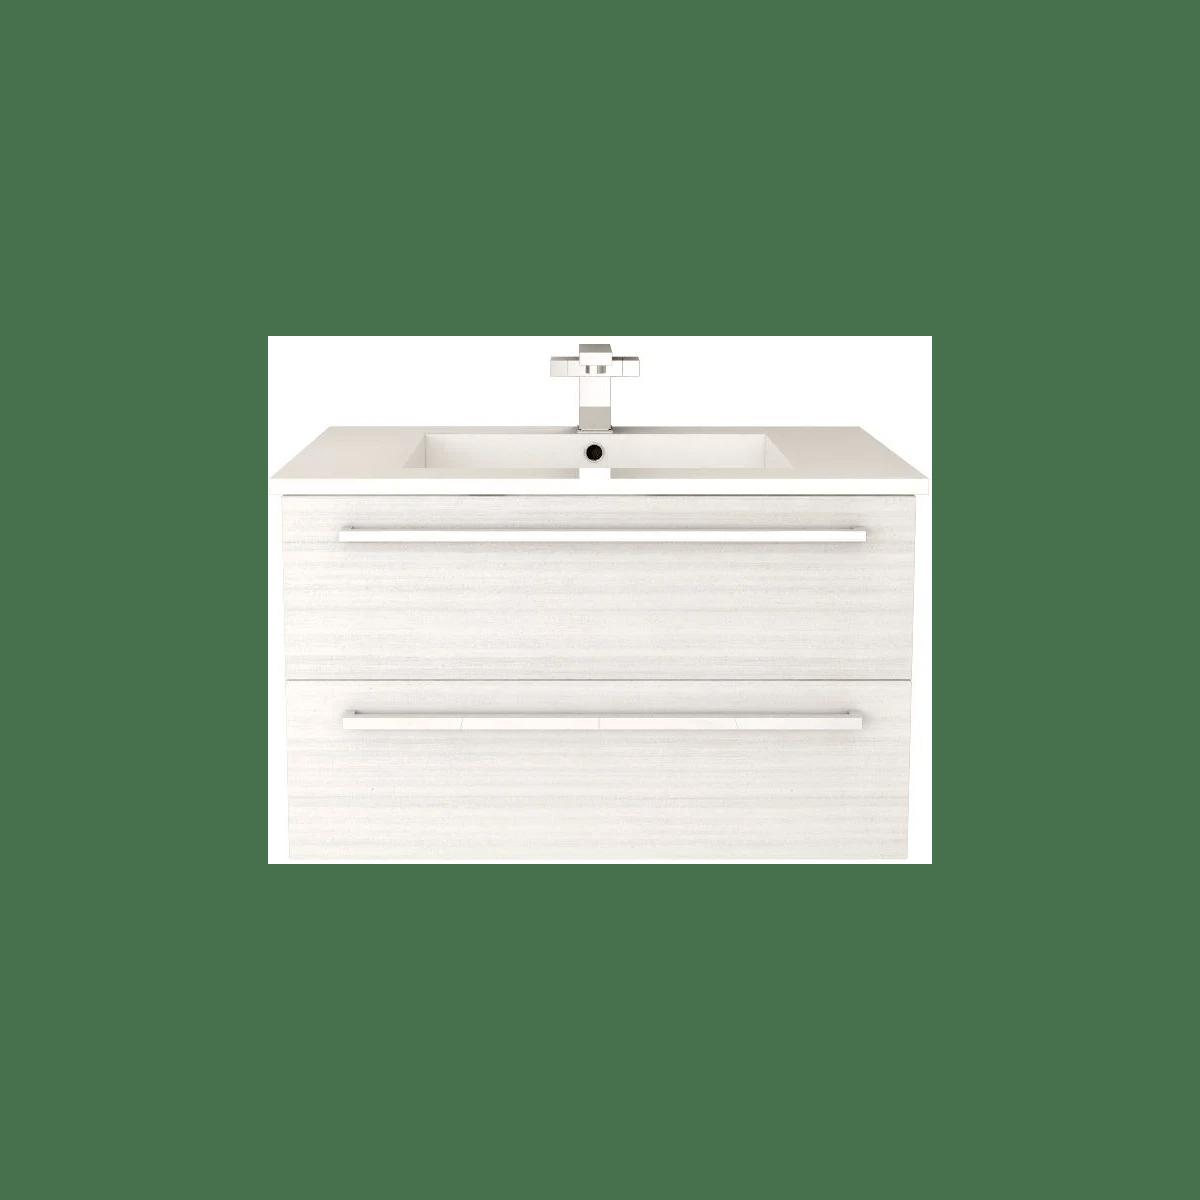 Cutler Kitchen And Bath Fv W Chocolate30 White Chocolate